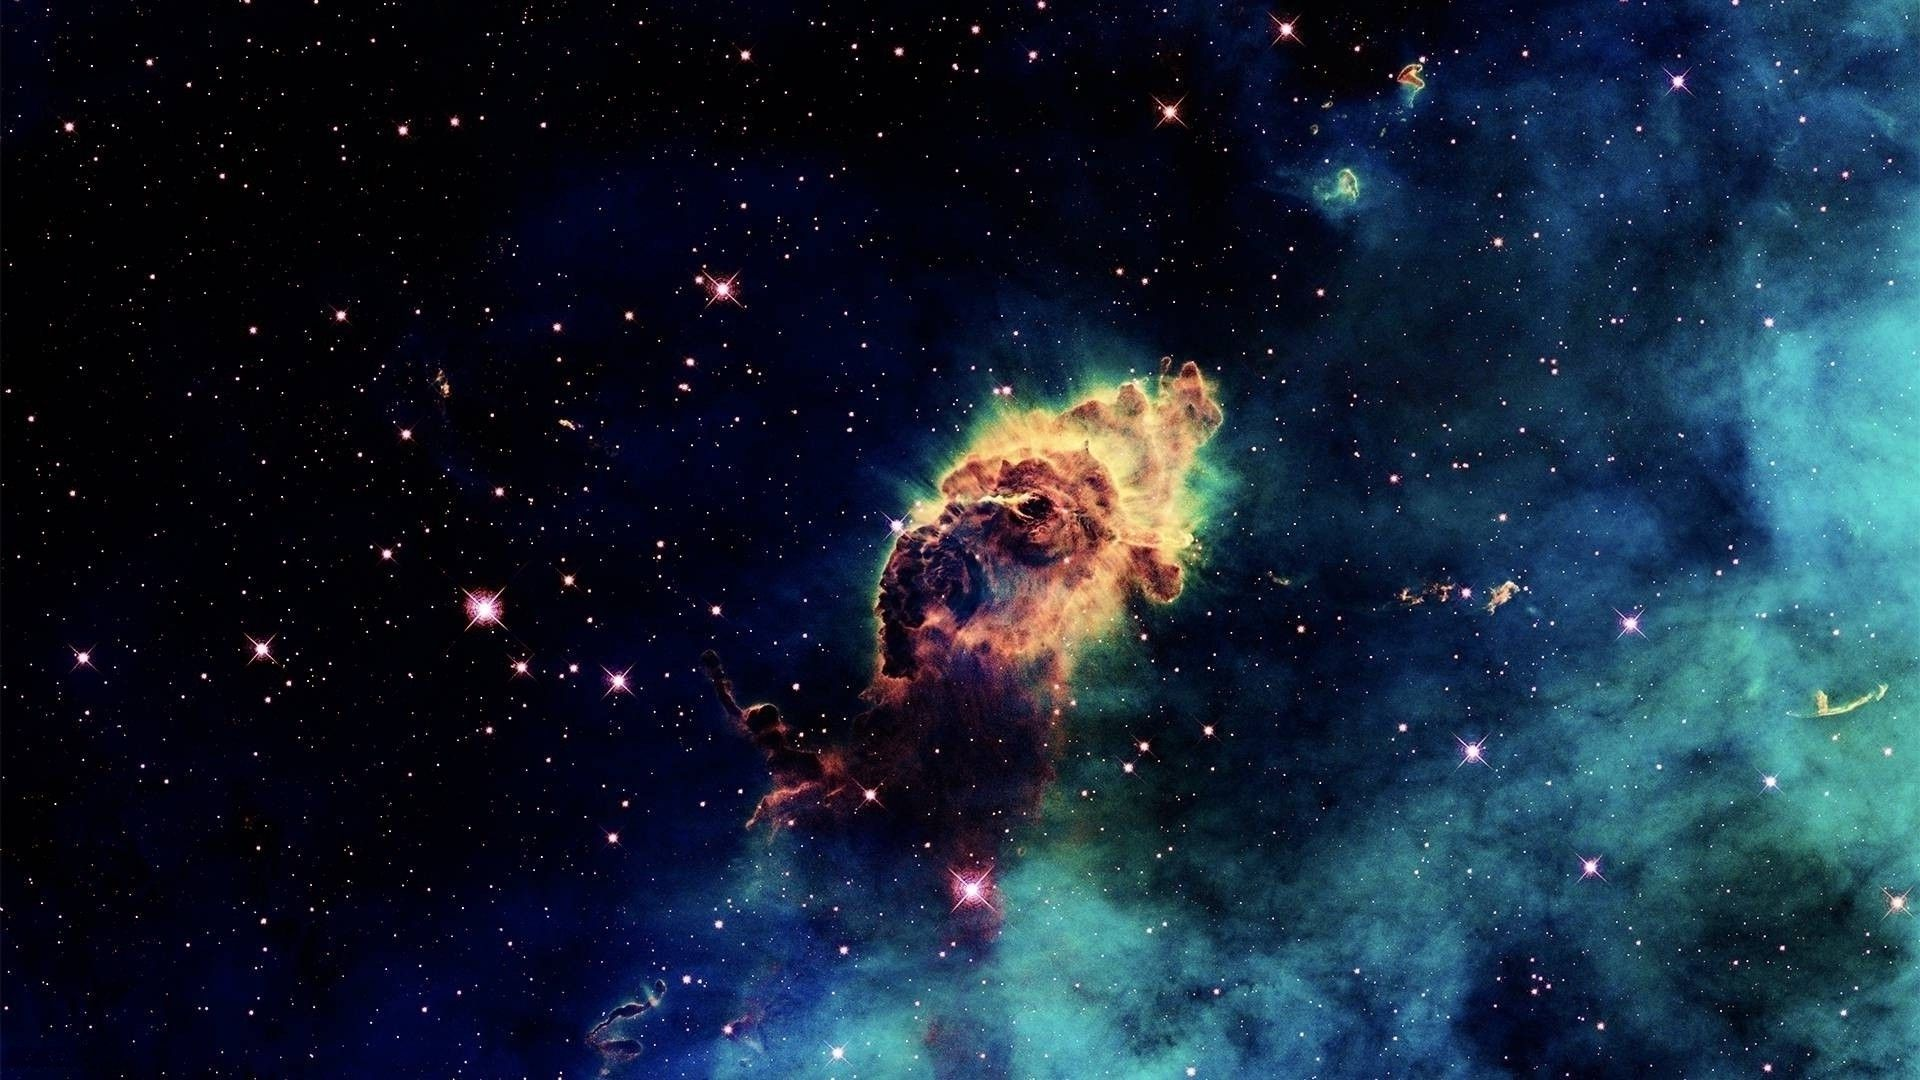 Hd wallpaper universe - Universe Stars Hd Wallpaper